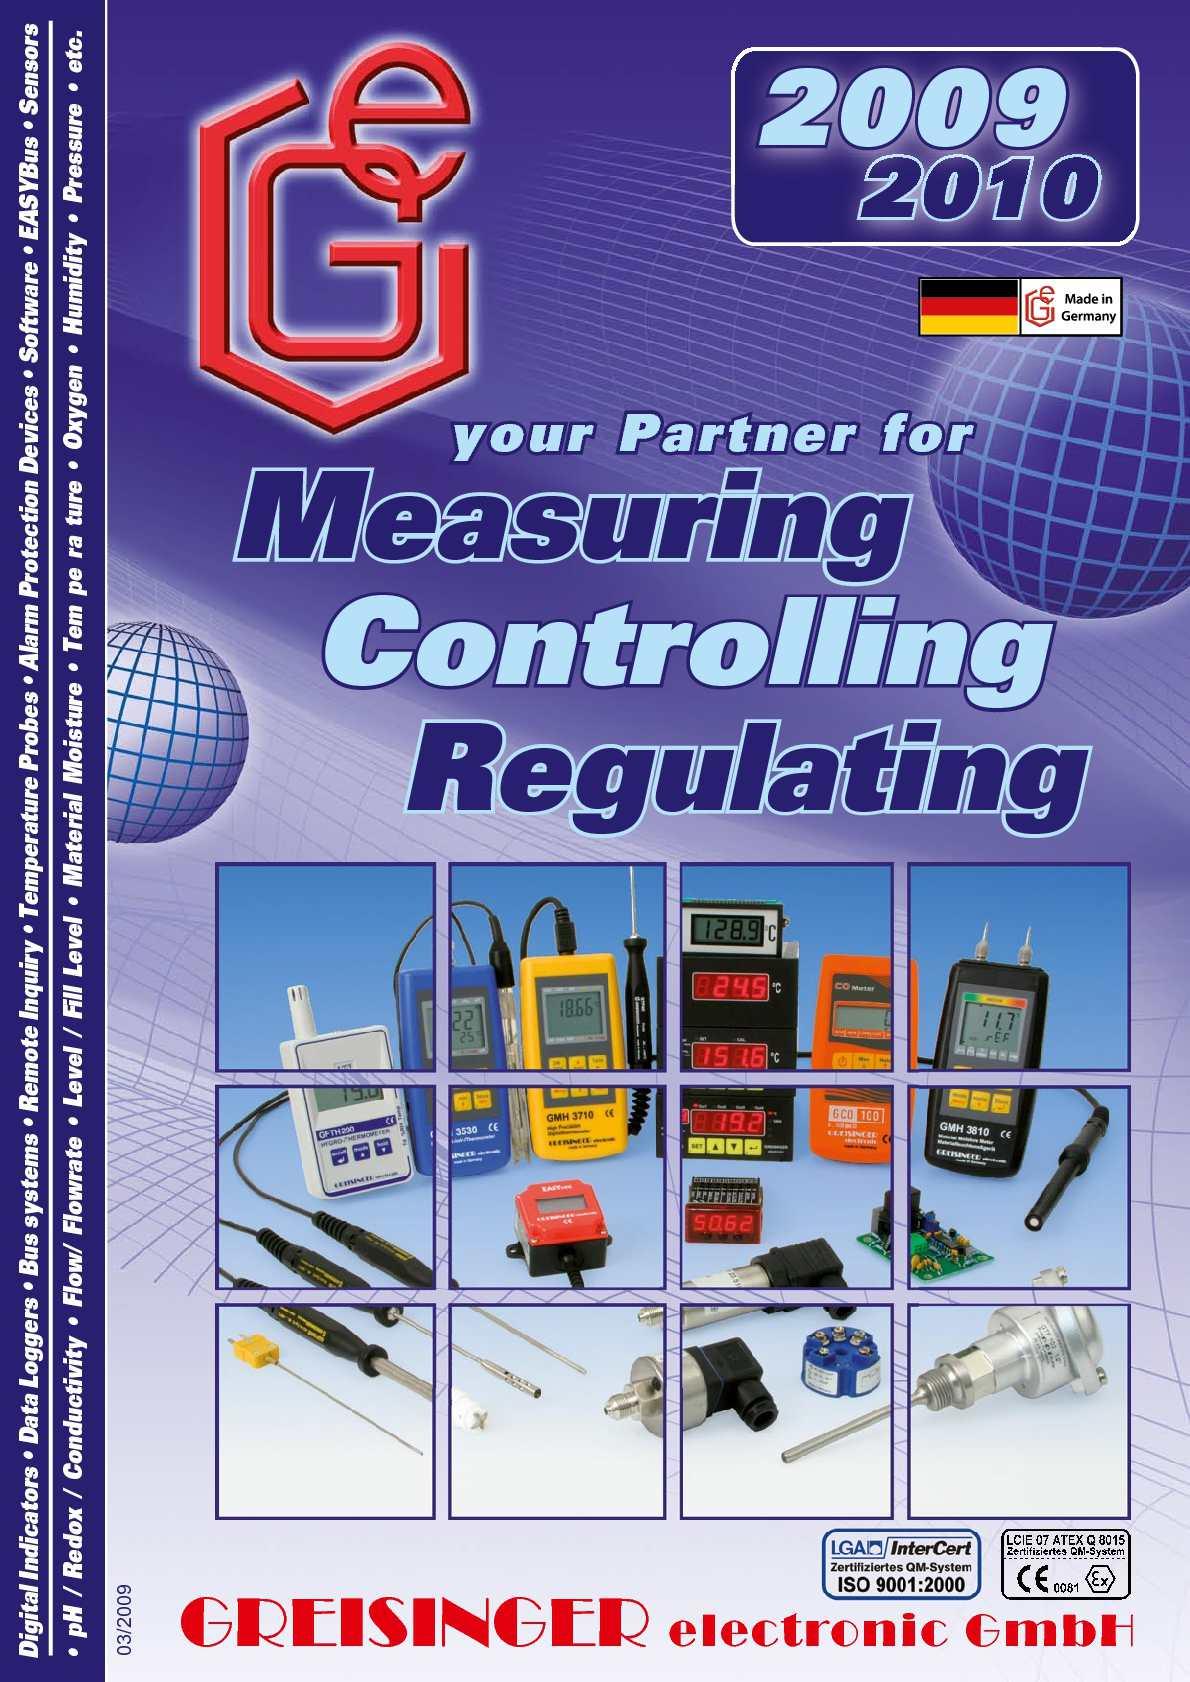 Greisinger Catalogue 2009